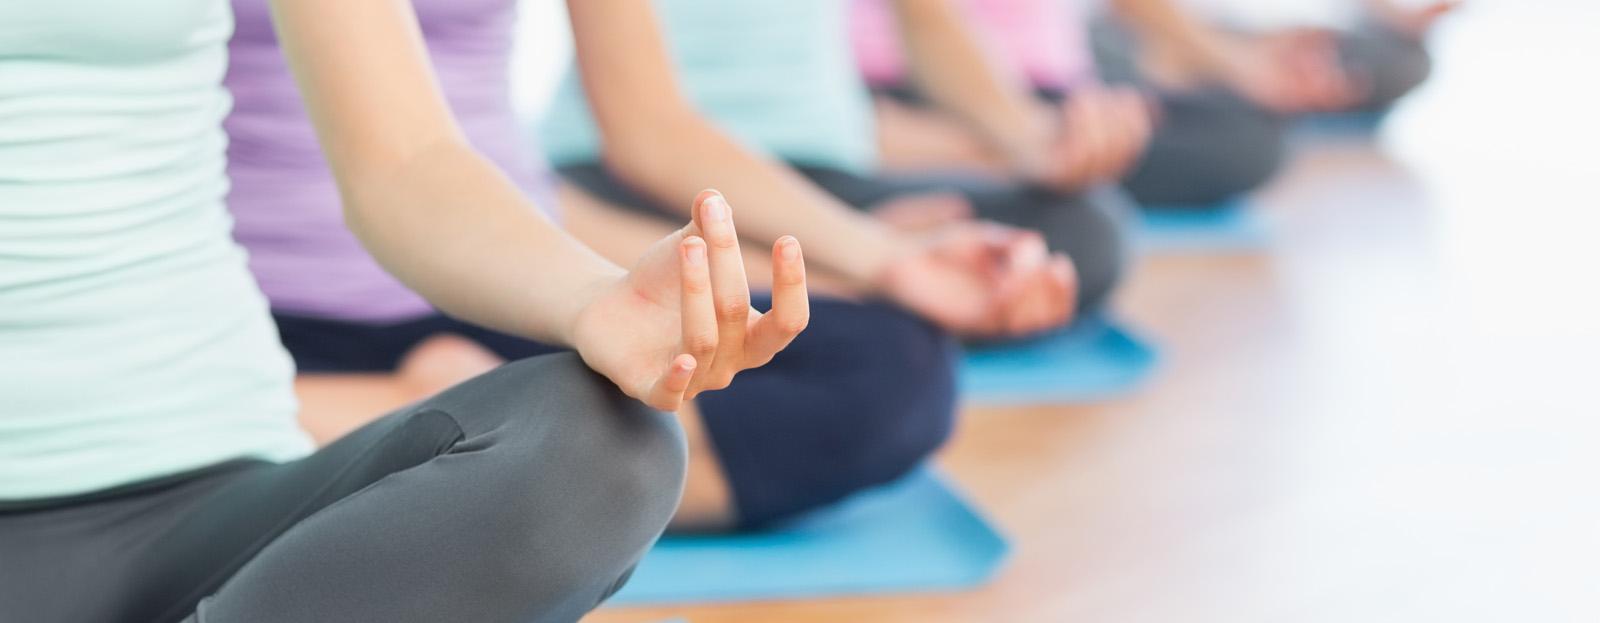 Yoga: Beyond Aesthetic Instagram Asana Posts